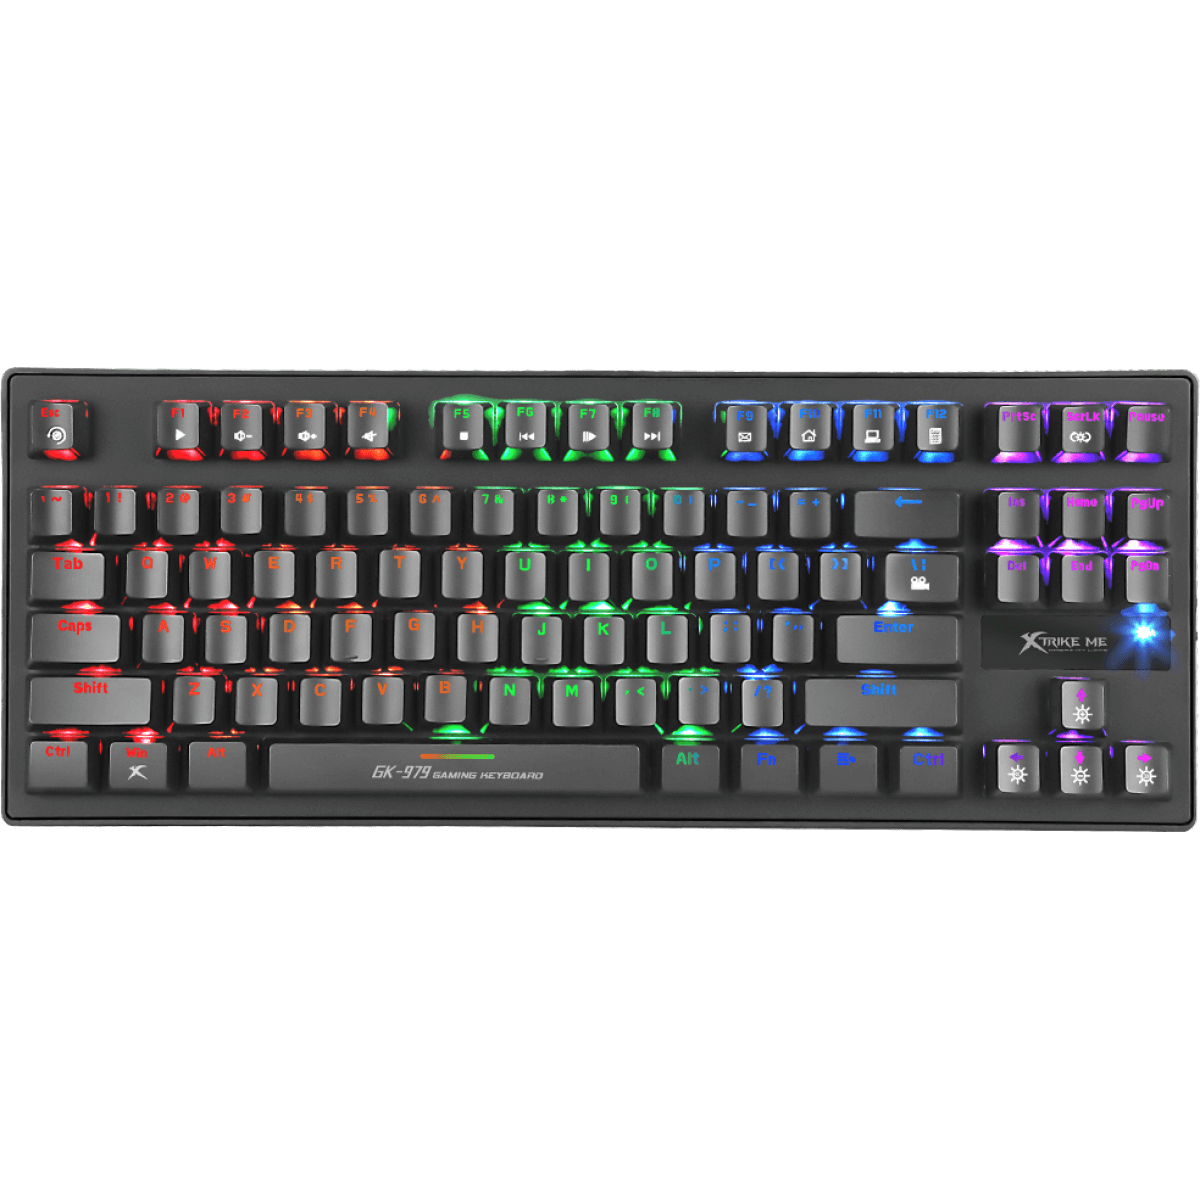 Teclado Gamer Mecânico Xtrike-me GK-979 Switch Blue Rainbow